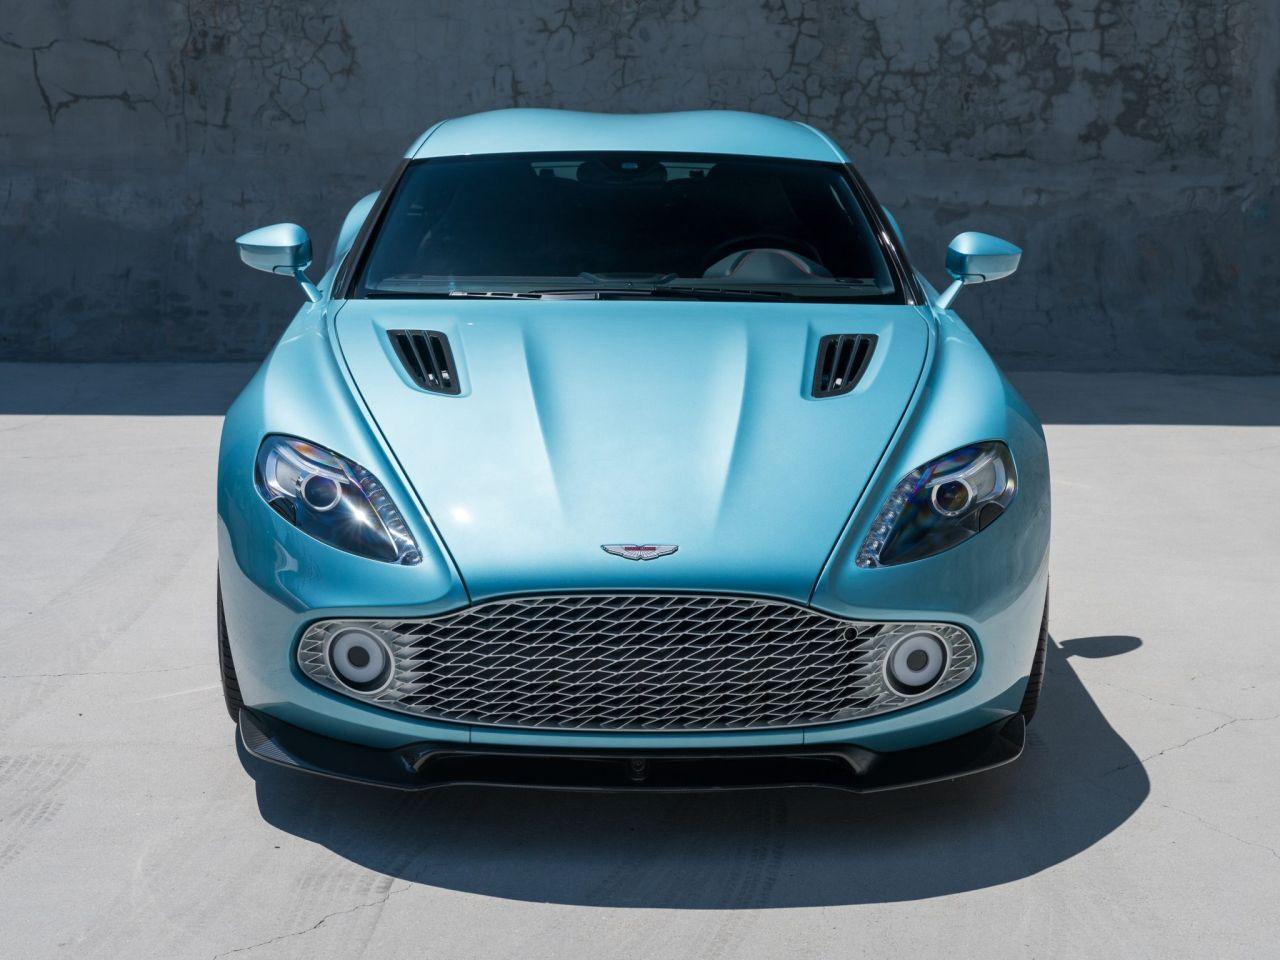 Aston Martin Vanquish By Zagato - Lady Signorina 21